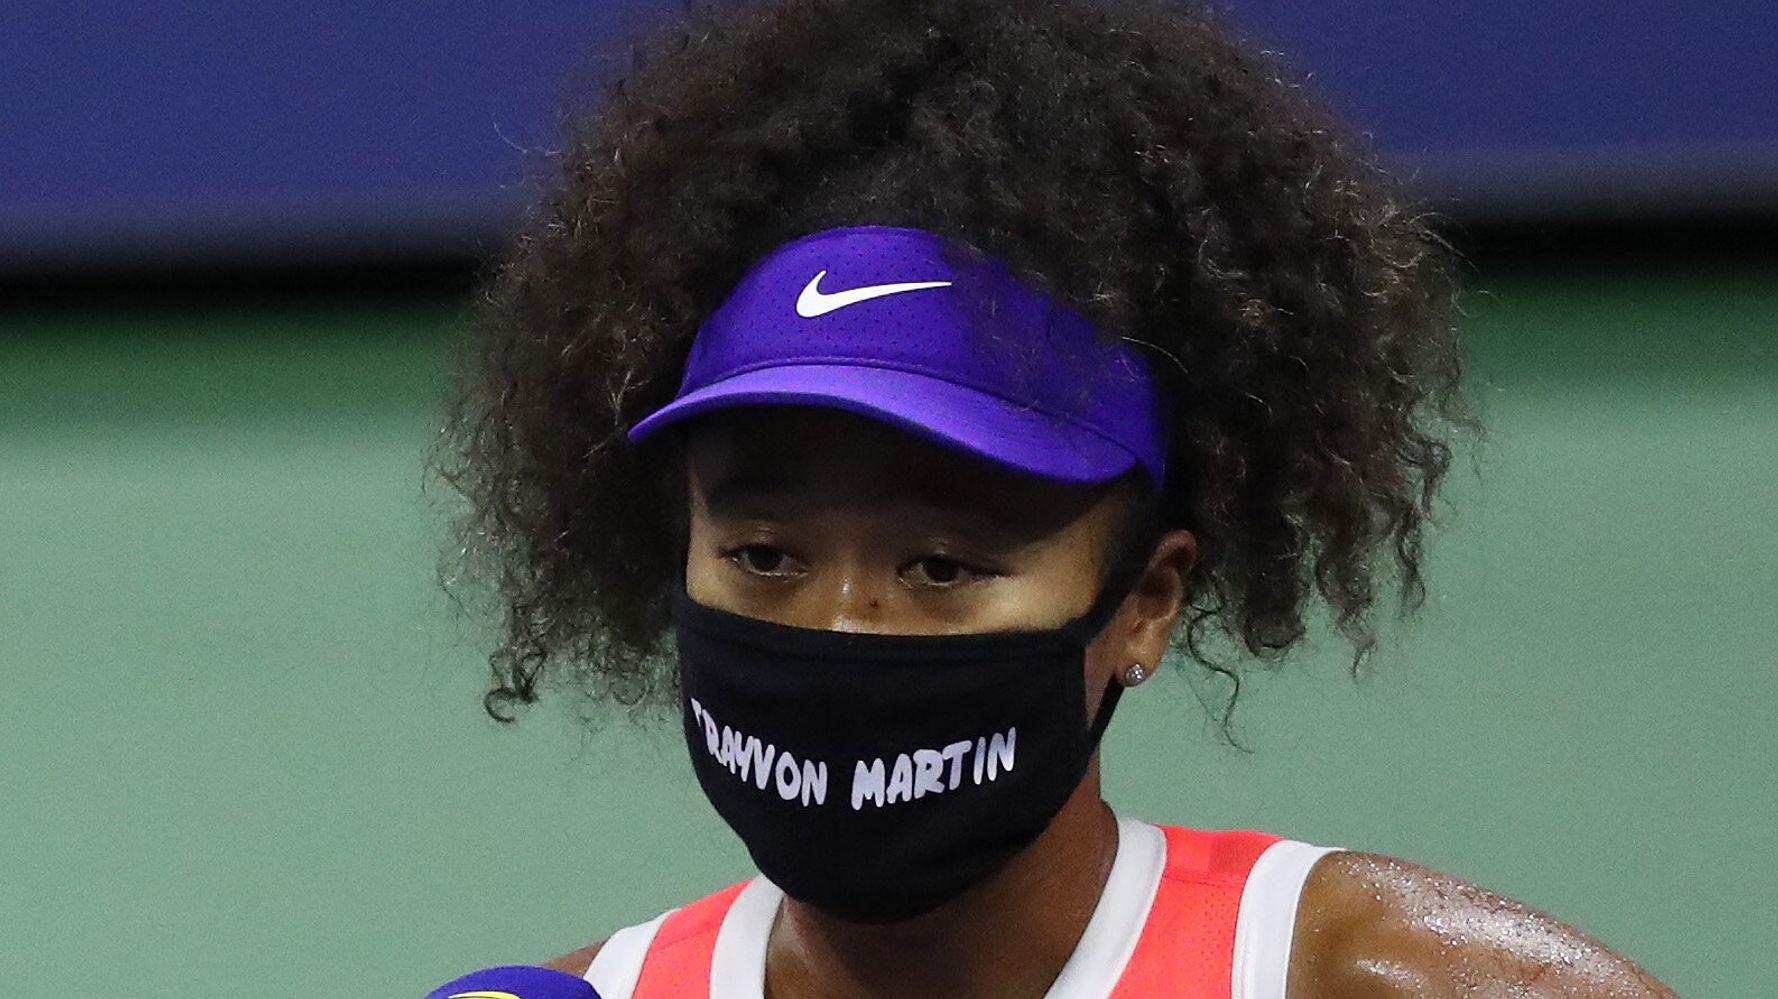 Naomi Osaka's Powerful U.S. Open Statements Continue With Trayvon Martin Mask 1